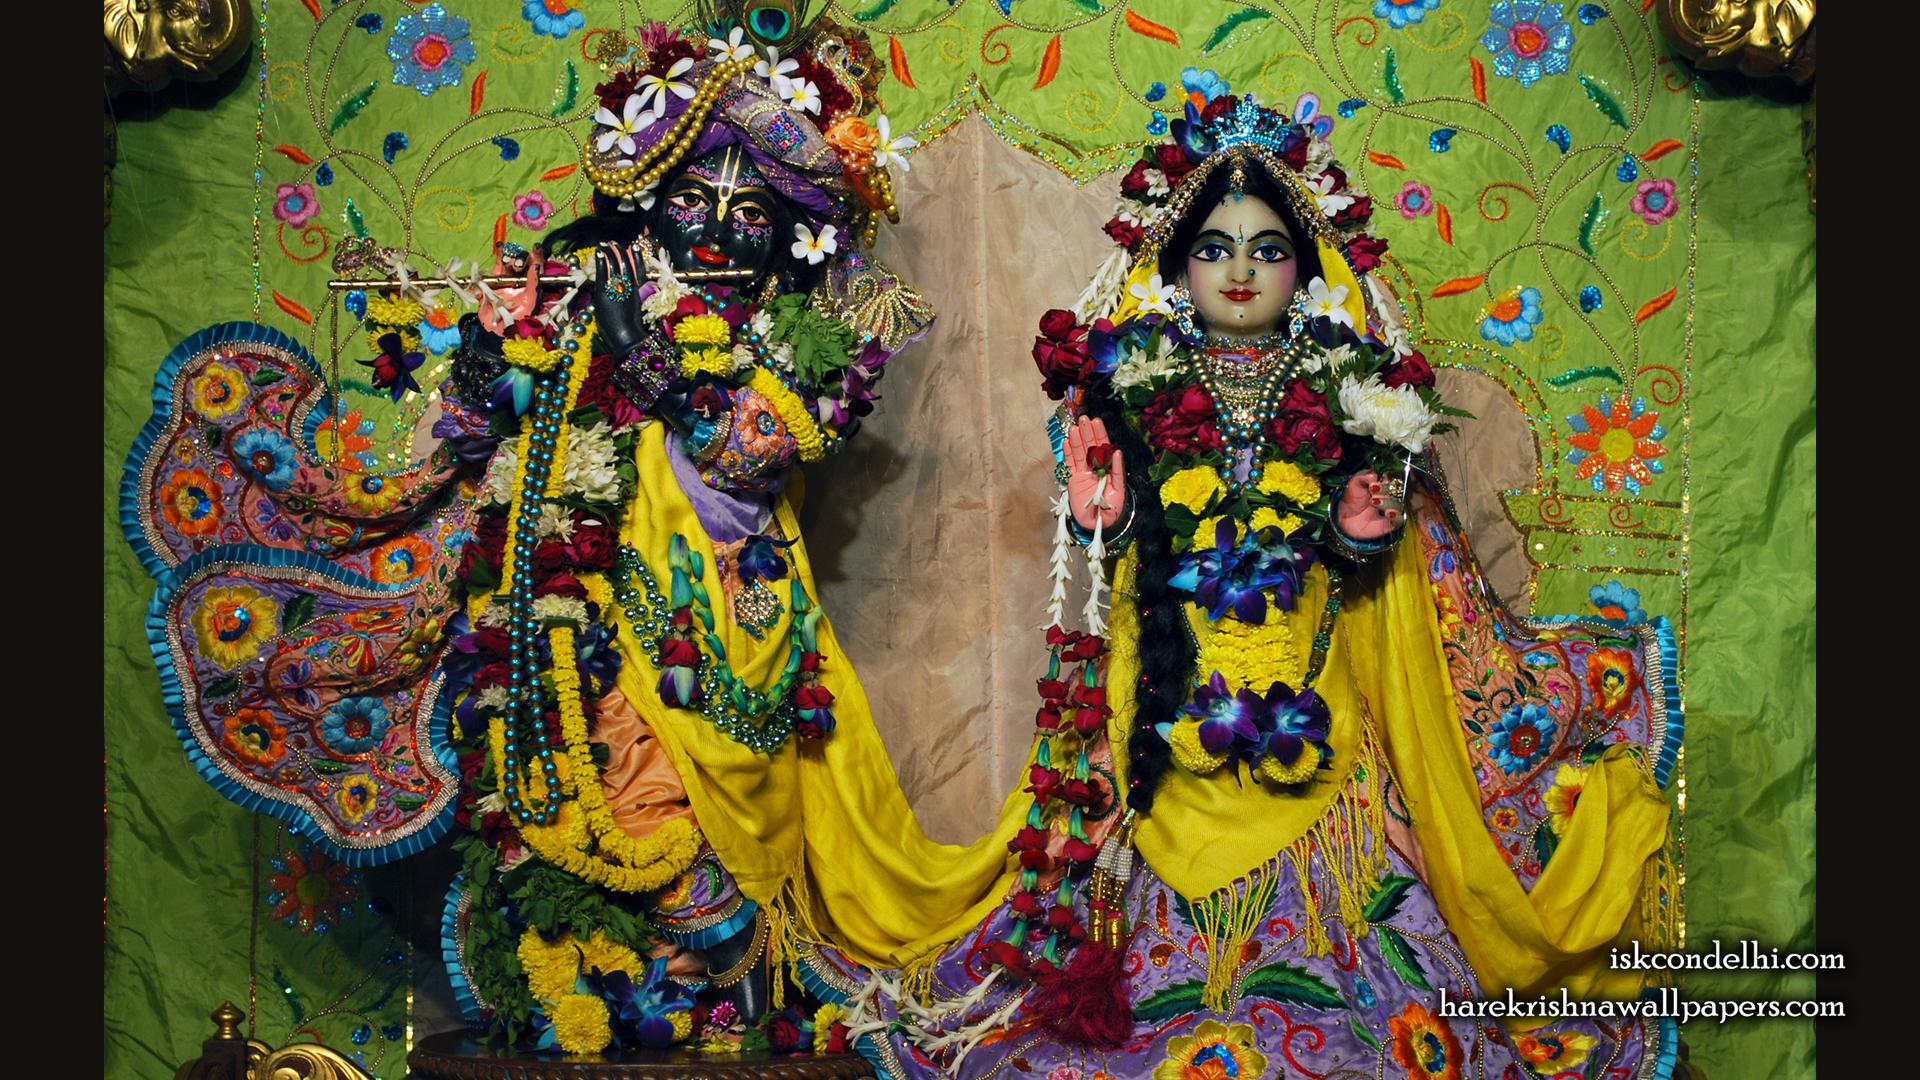 Sri Sri Radha Parthasarathi Wallpaper (008) Size 1920x1080 Download